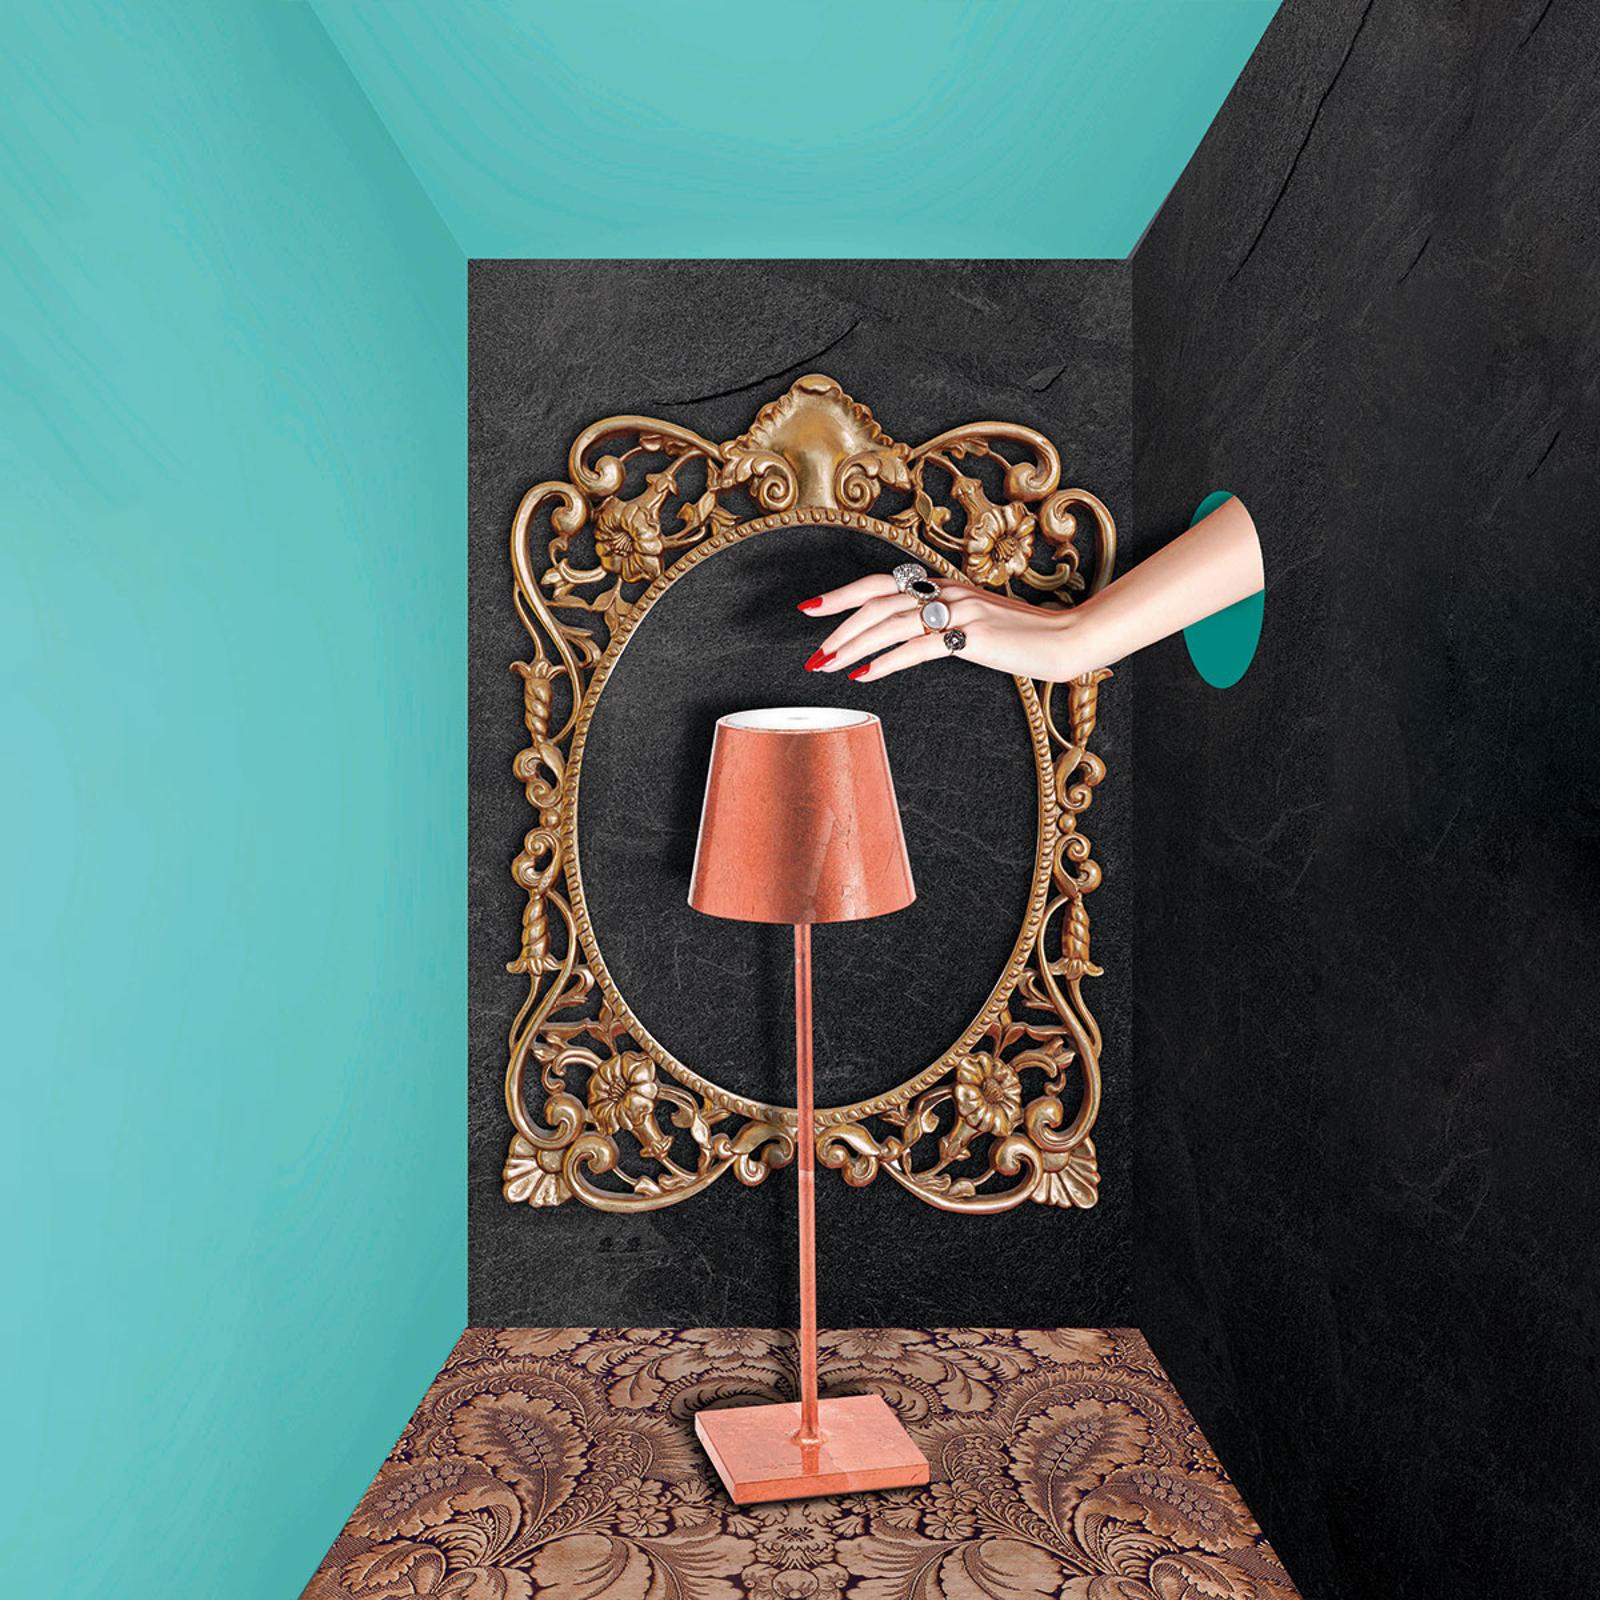 LED-Tischlampe Poldina mit Dekor, portabel, kupfer